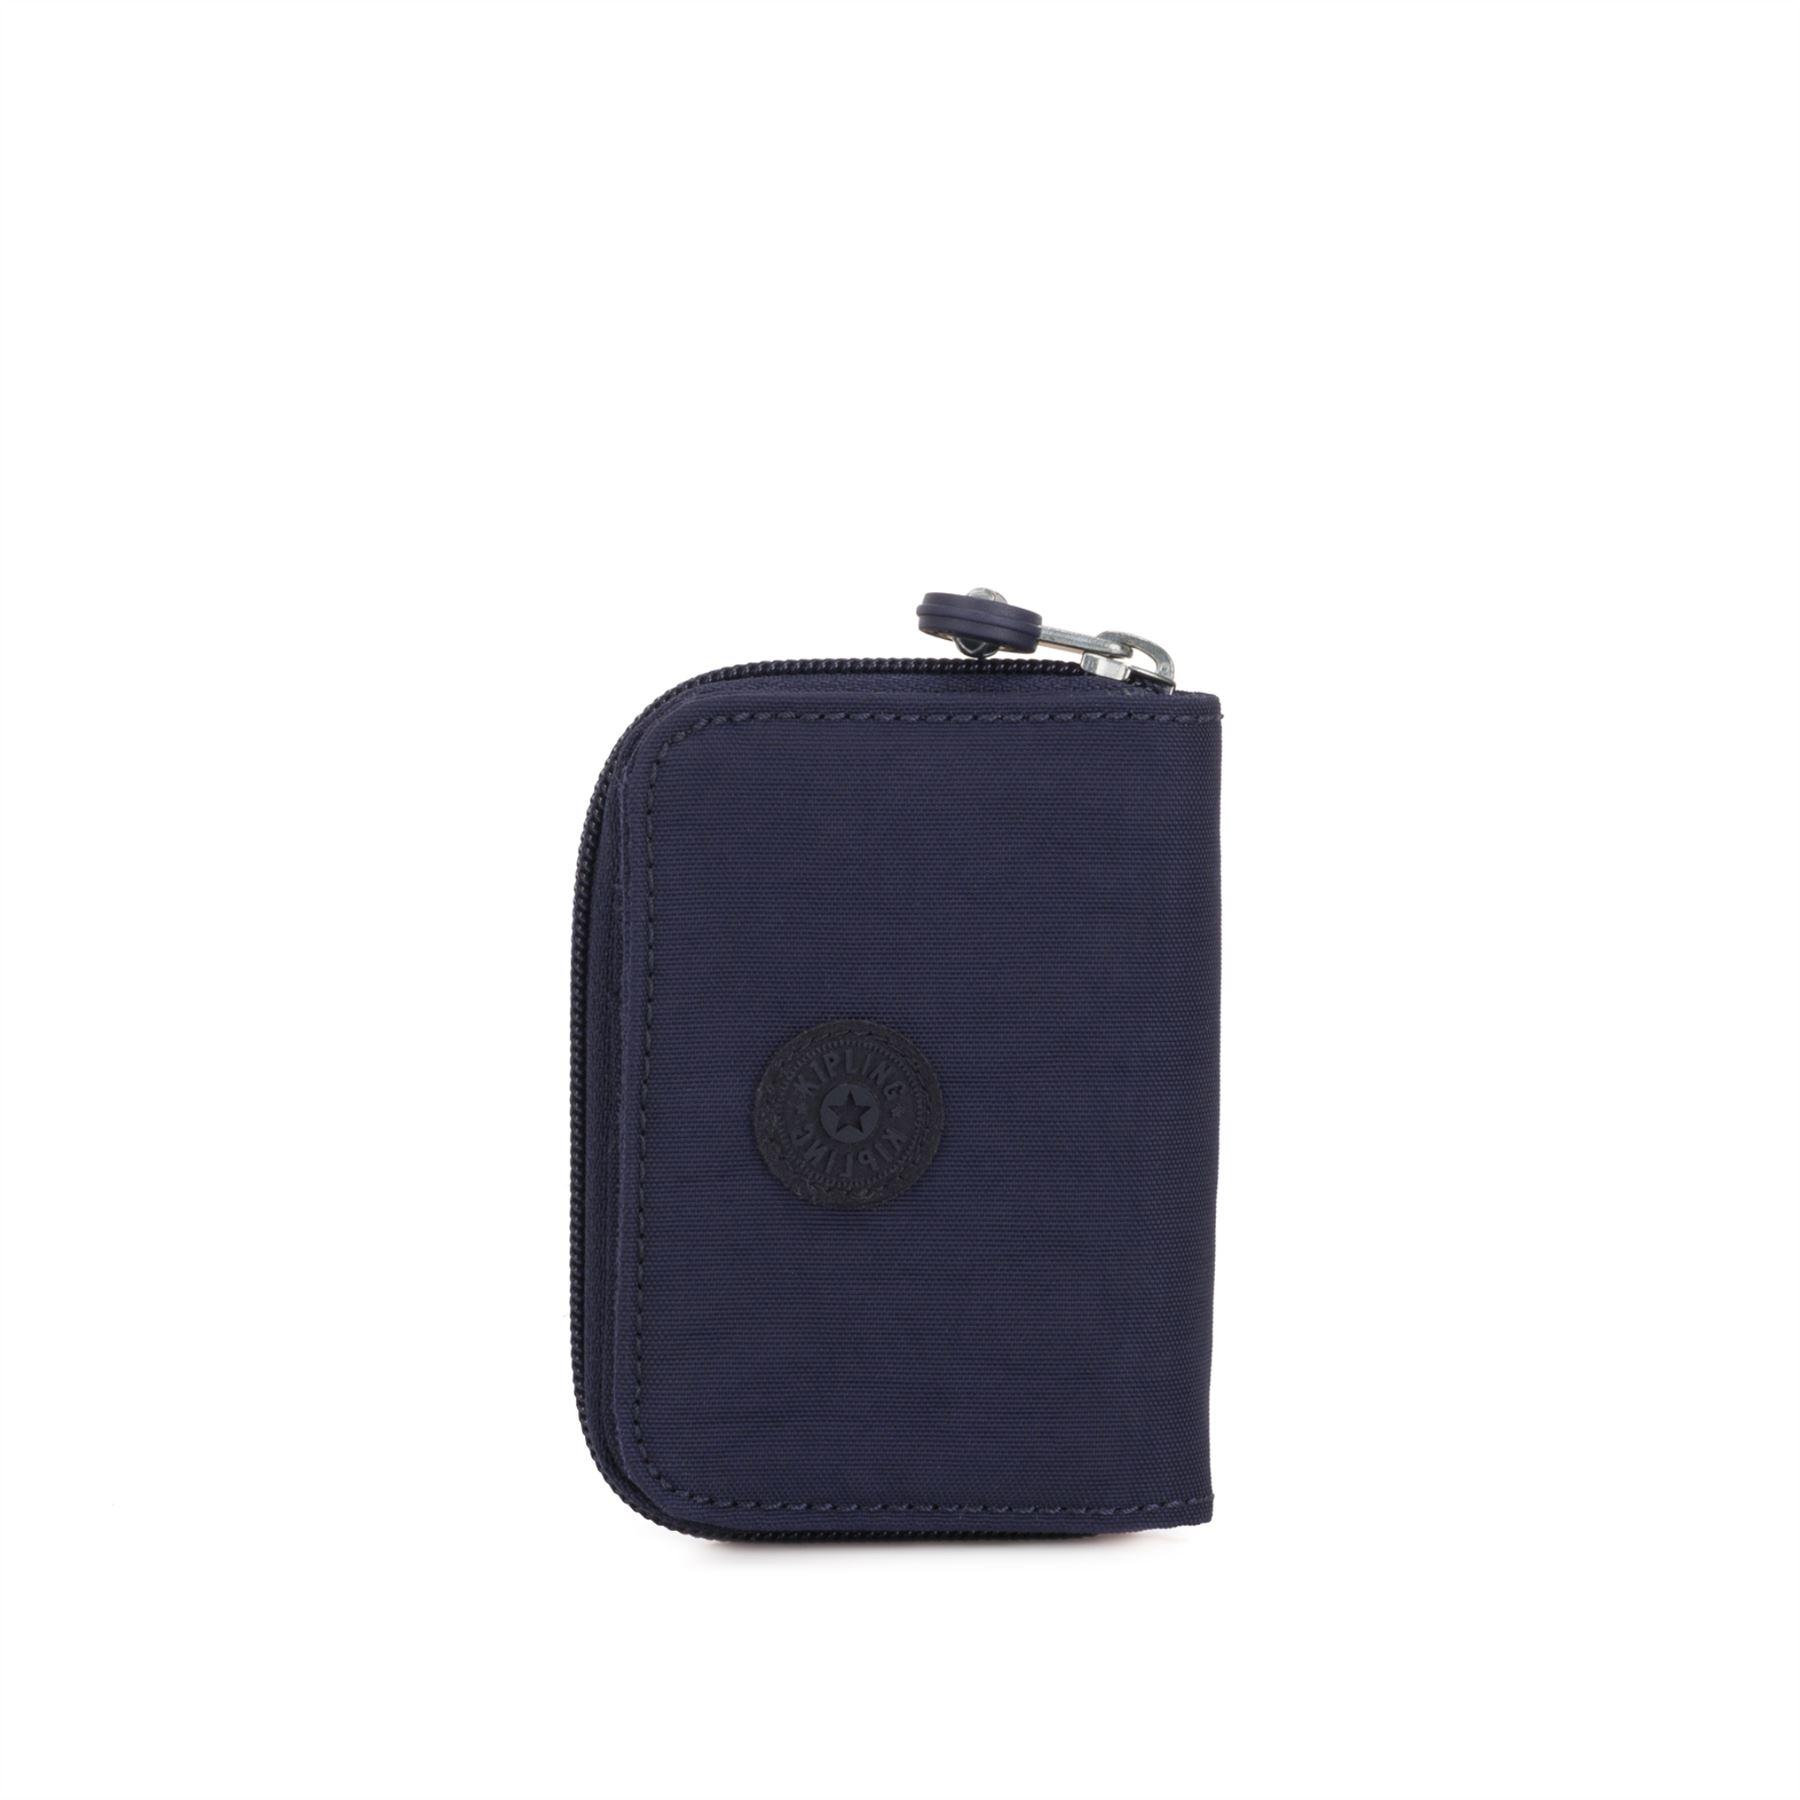 63b0a4518ef Kipling Tops Small Ladies Purse Wallet Designer Card Cash New 2019 ...